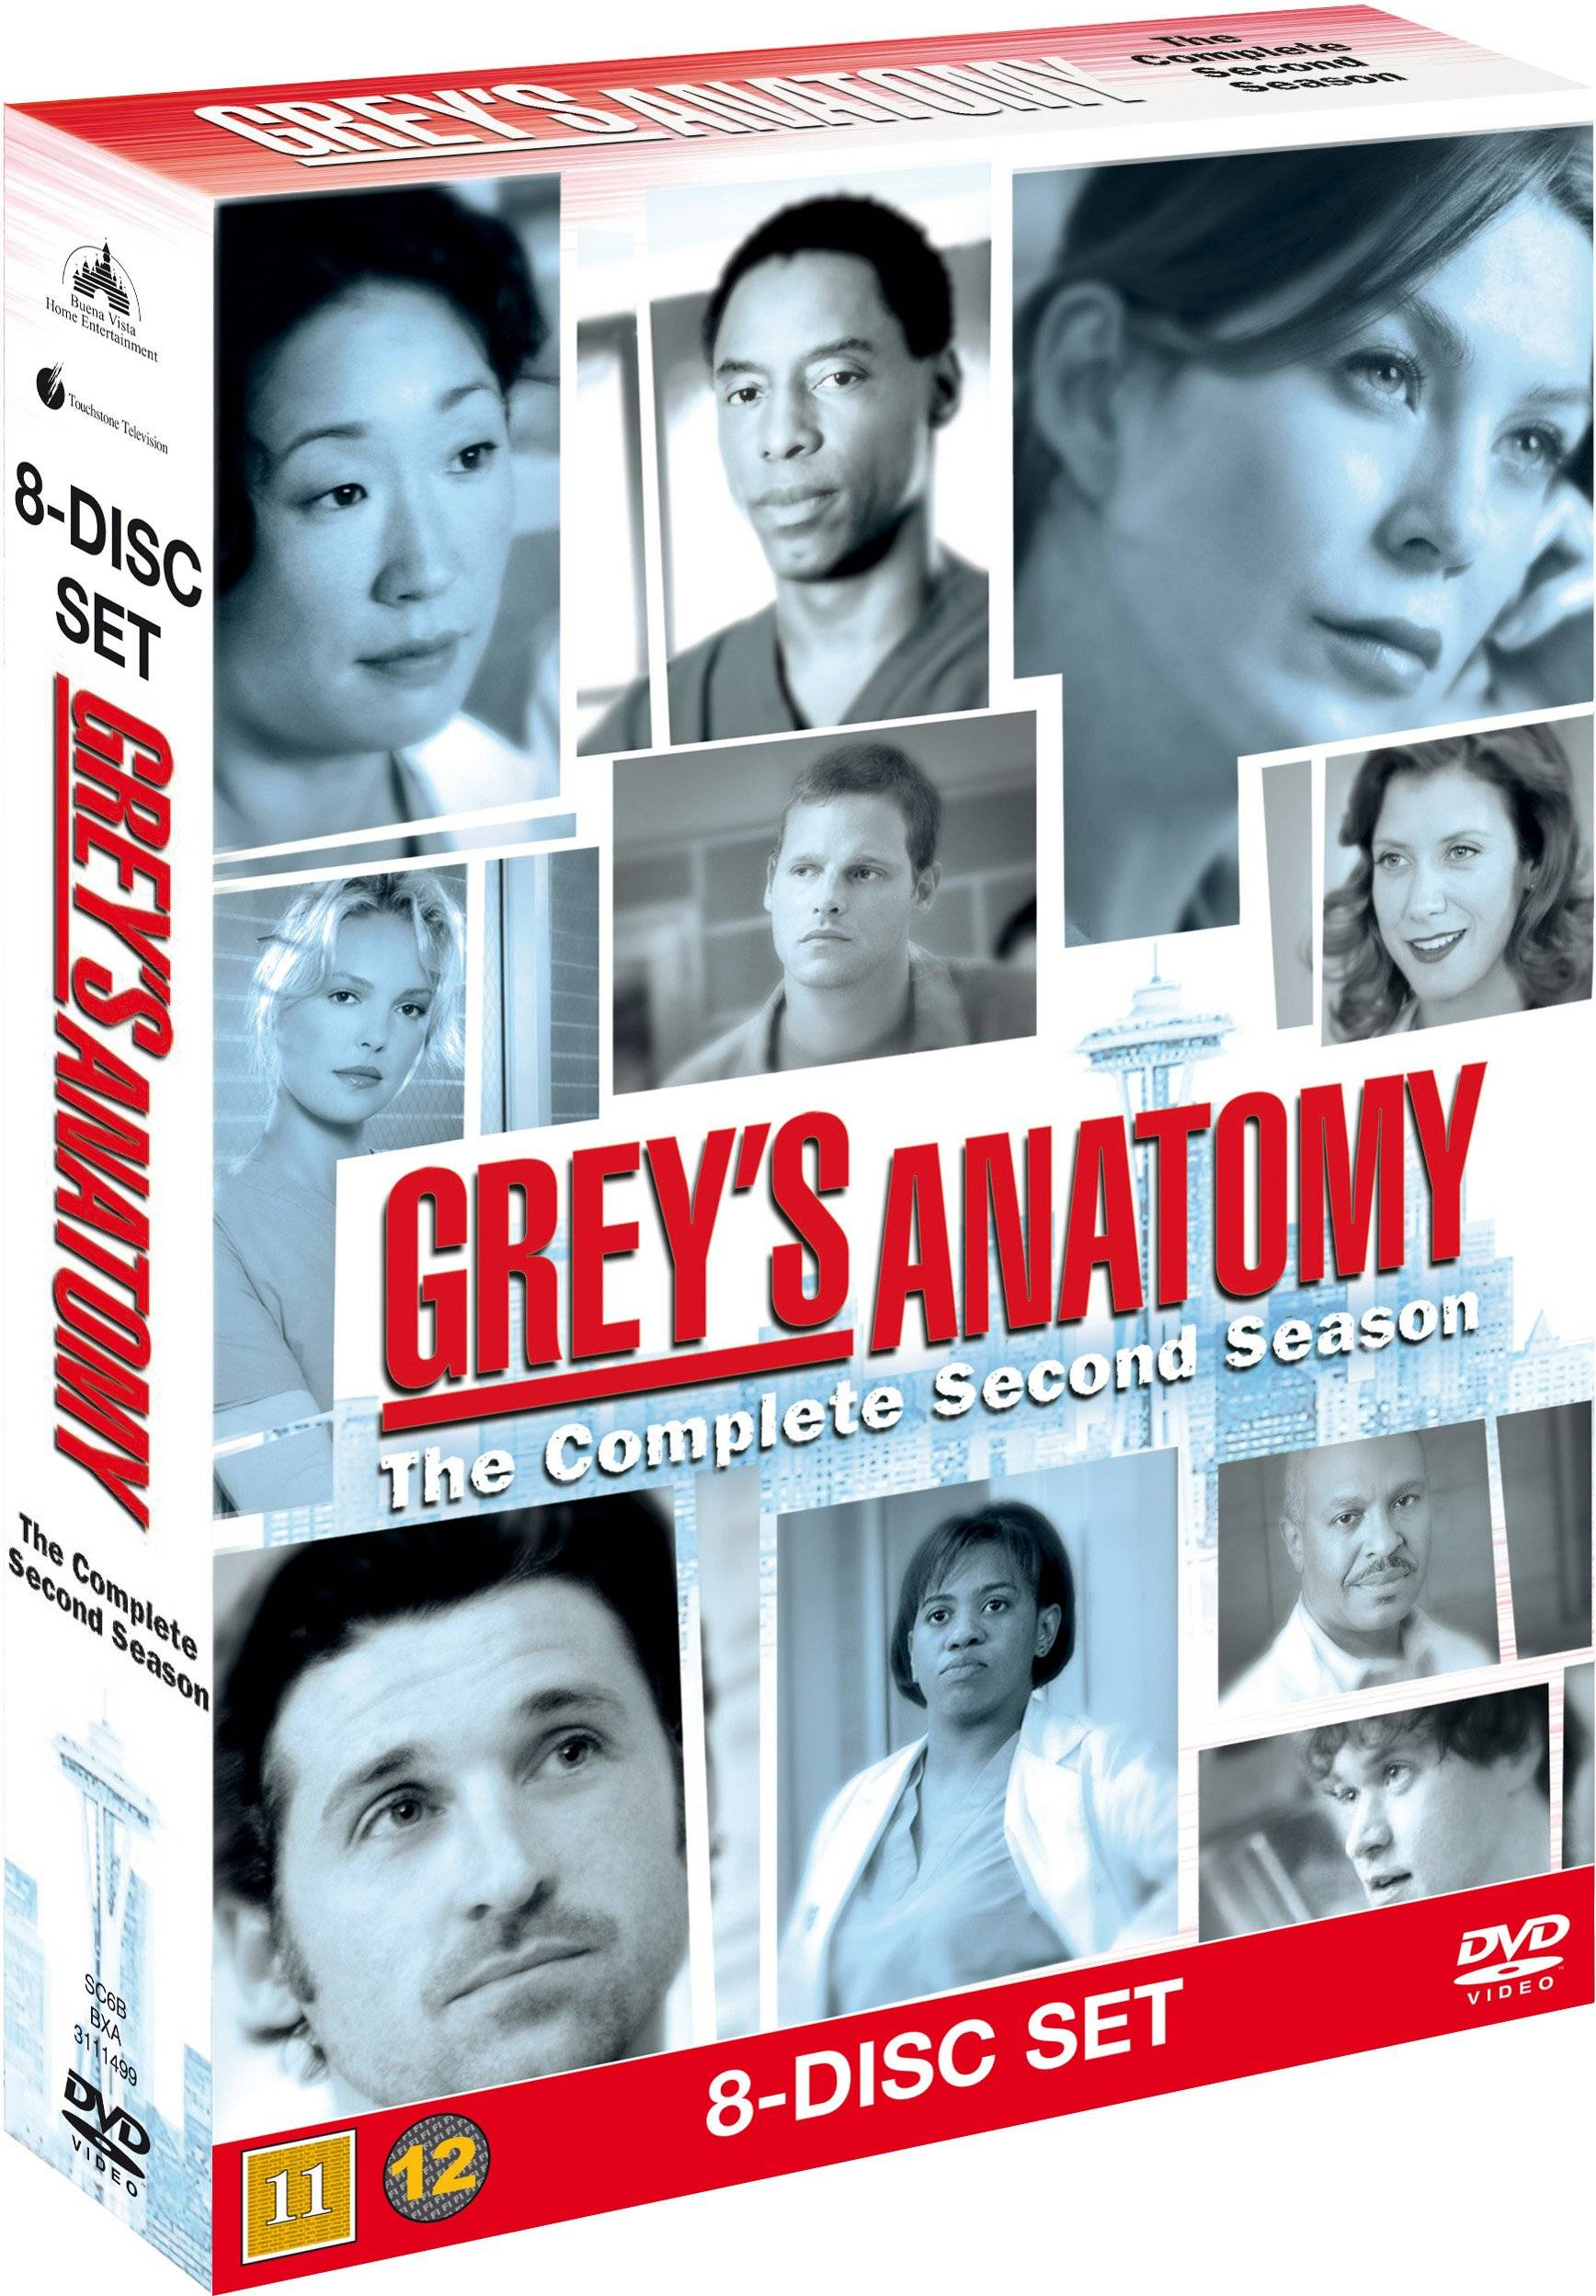 Greys Anatomy/Greys Hvide Verden saeson 2 DVD